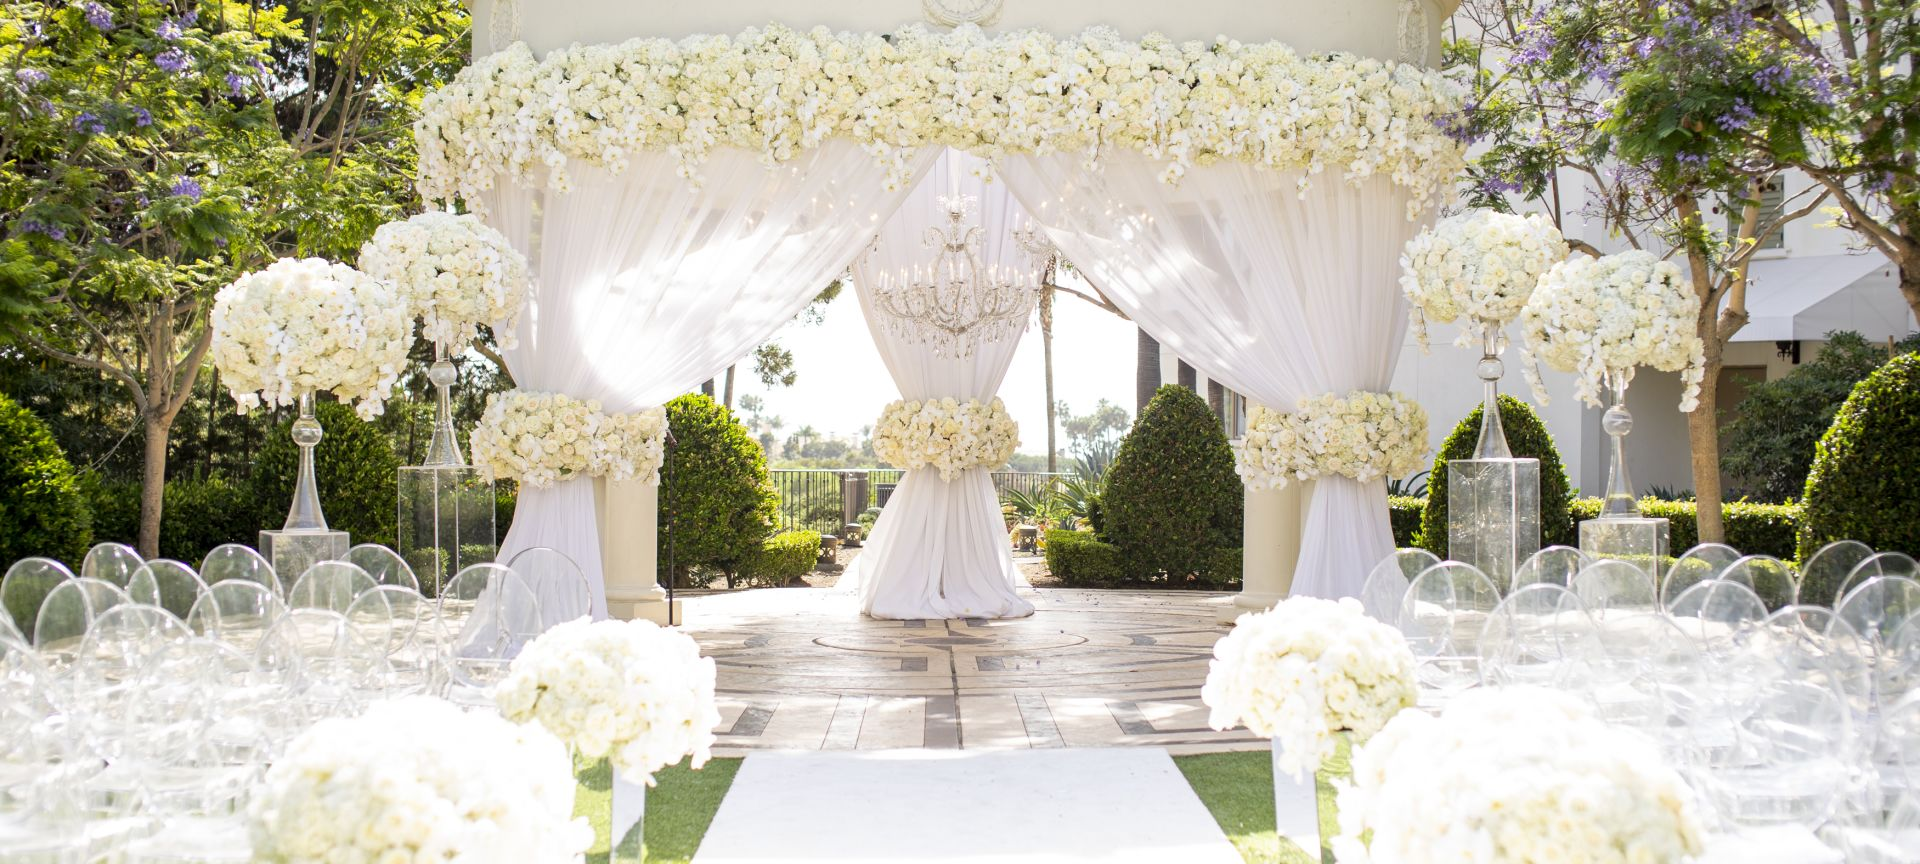 Destination Weddings in Florida Keys   Hawks Cay Resort